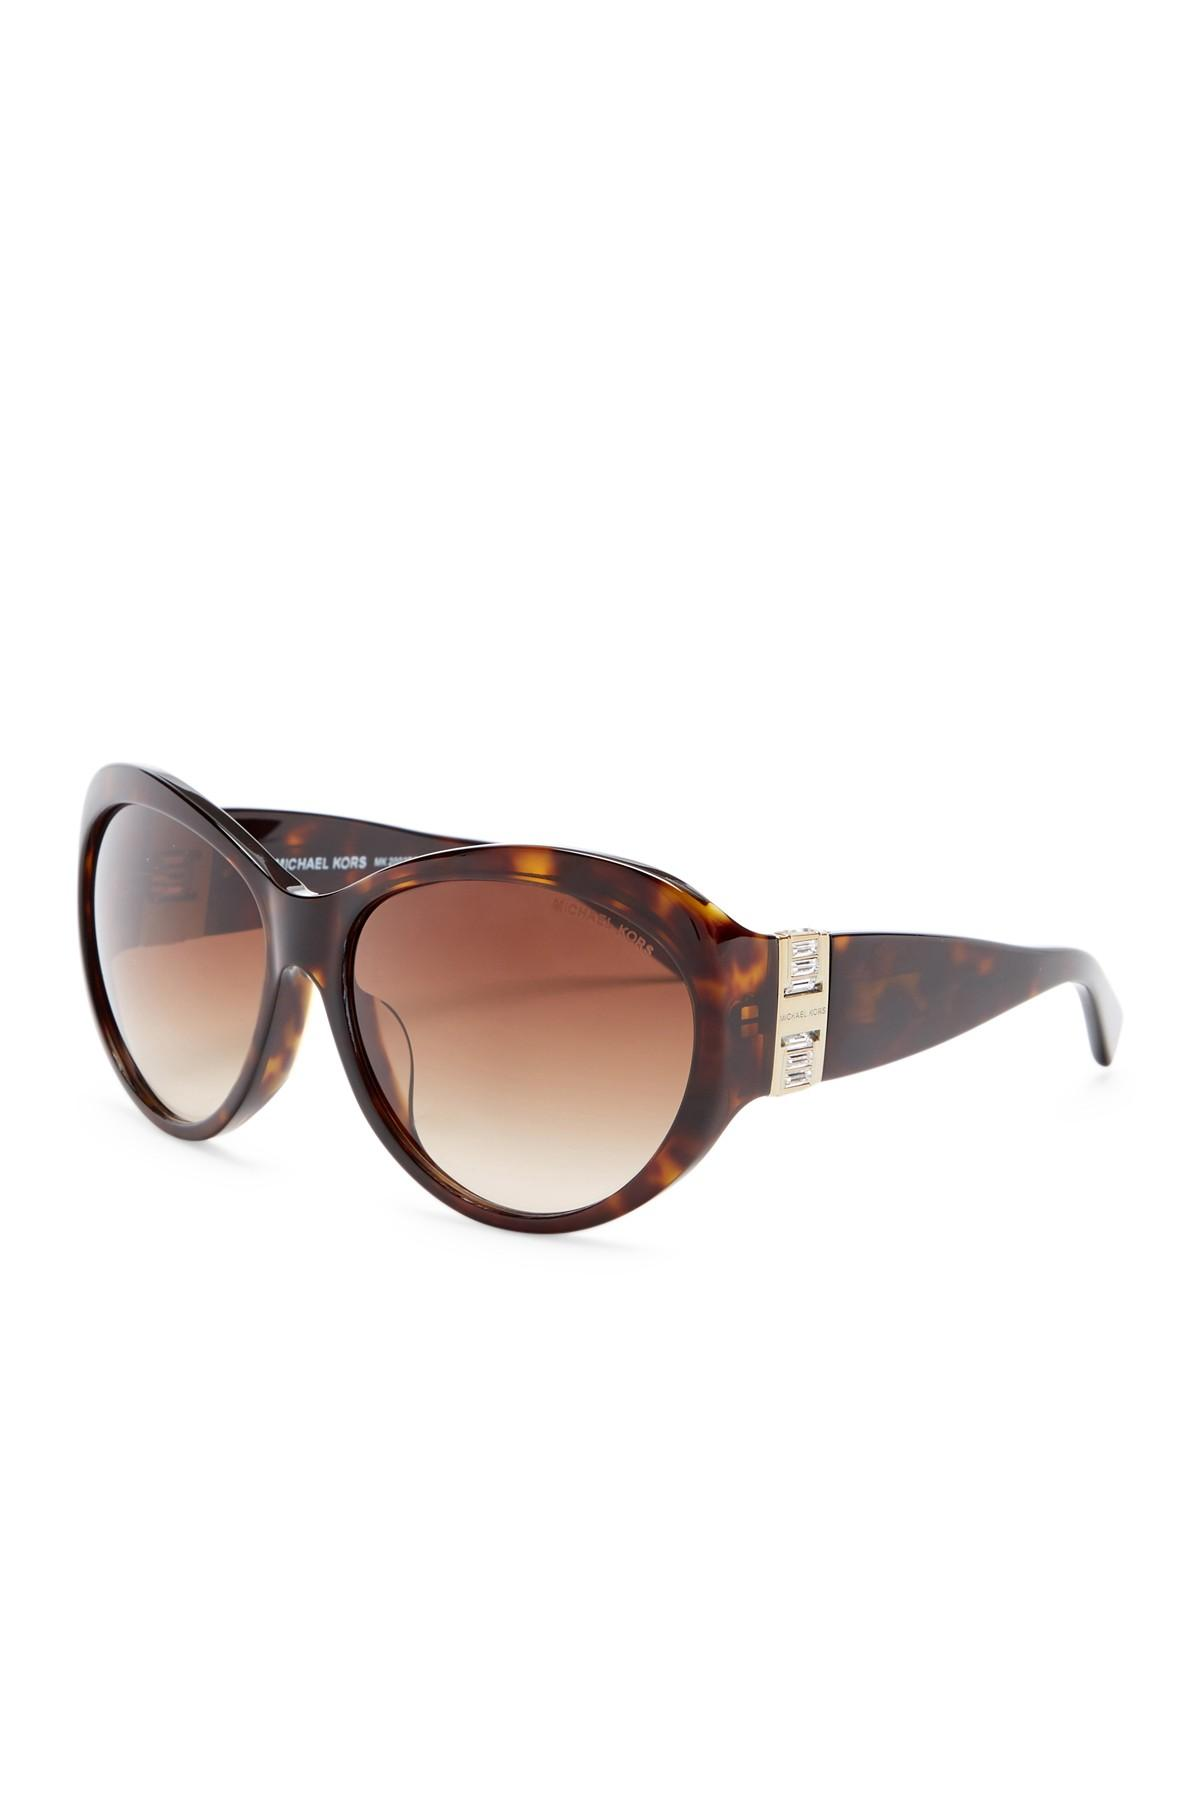 802d5d4295 Lyst - Michael Kors Women  39 s Paris Cat Eye Sunglasses ...